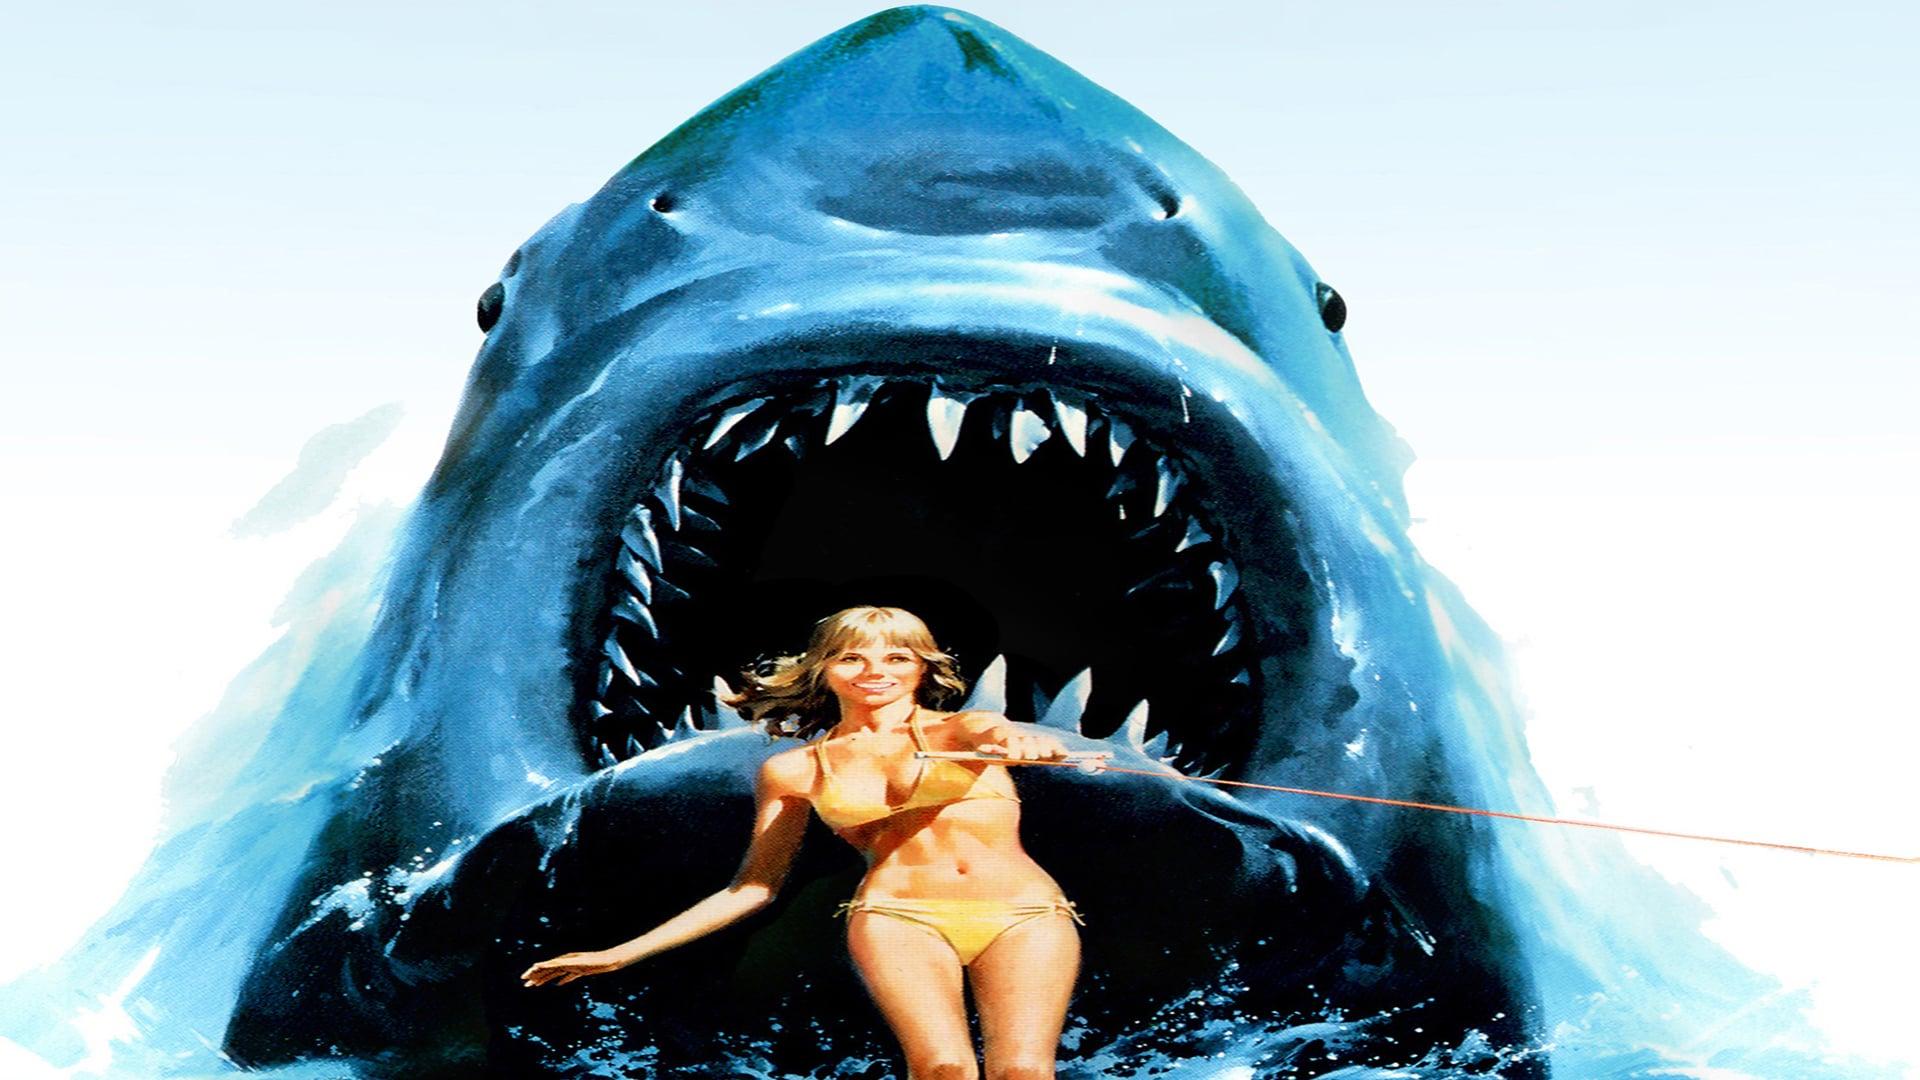 кино про акул картинки продукцию типовым